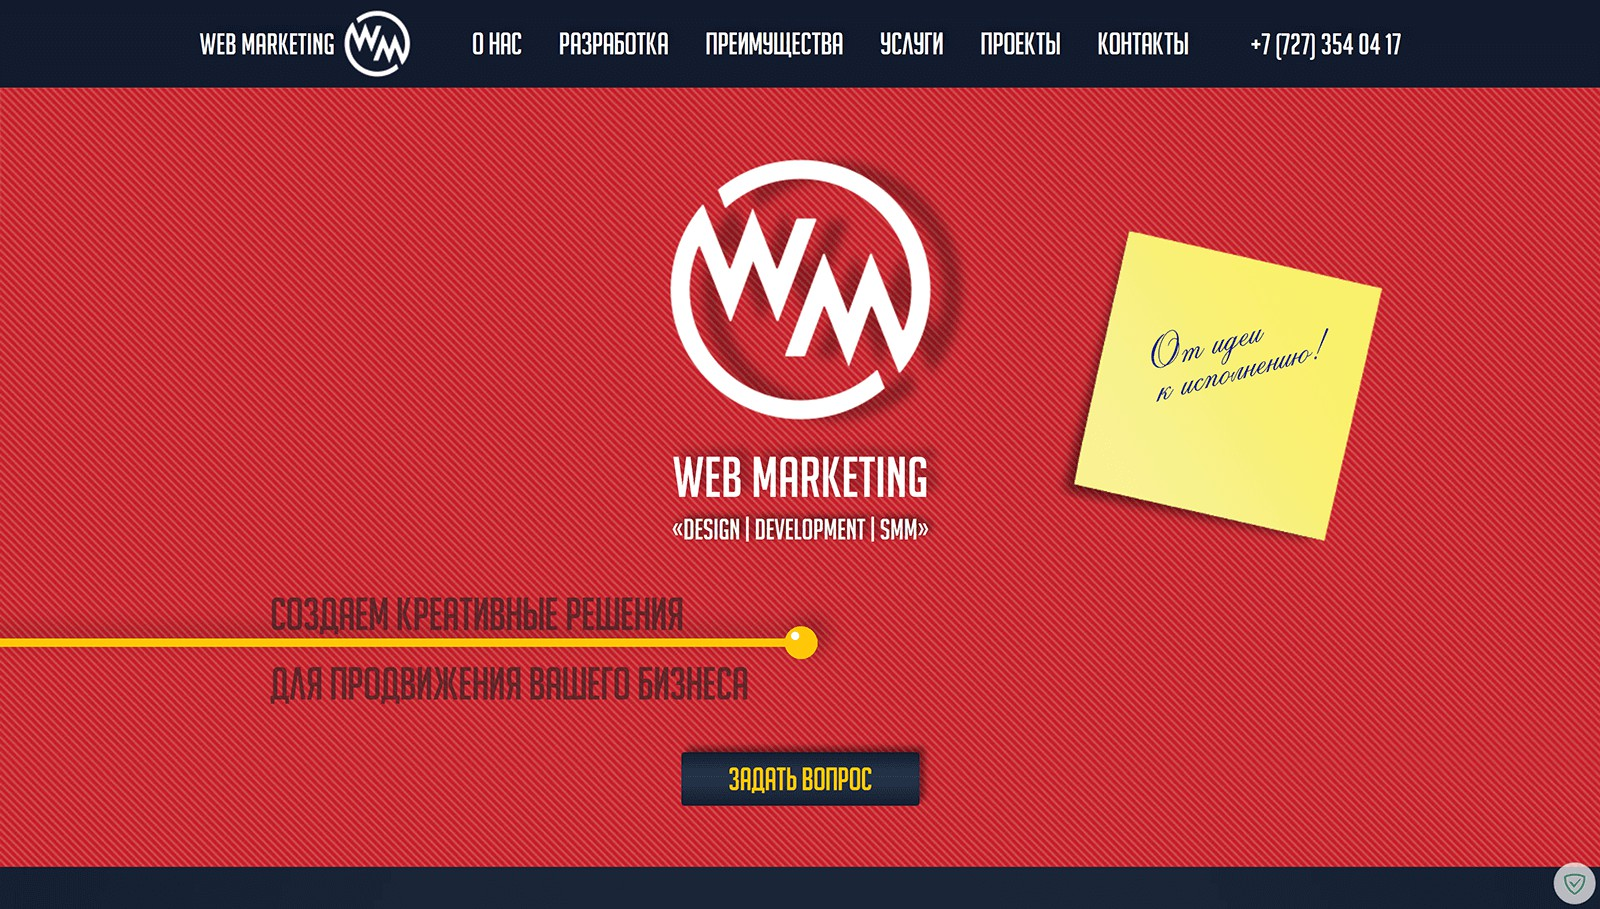 """Web Marketing"" — веб-студия в Казахстане"